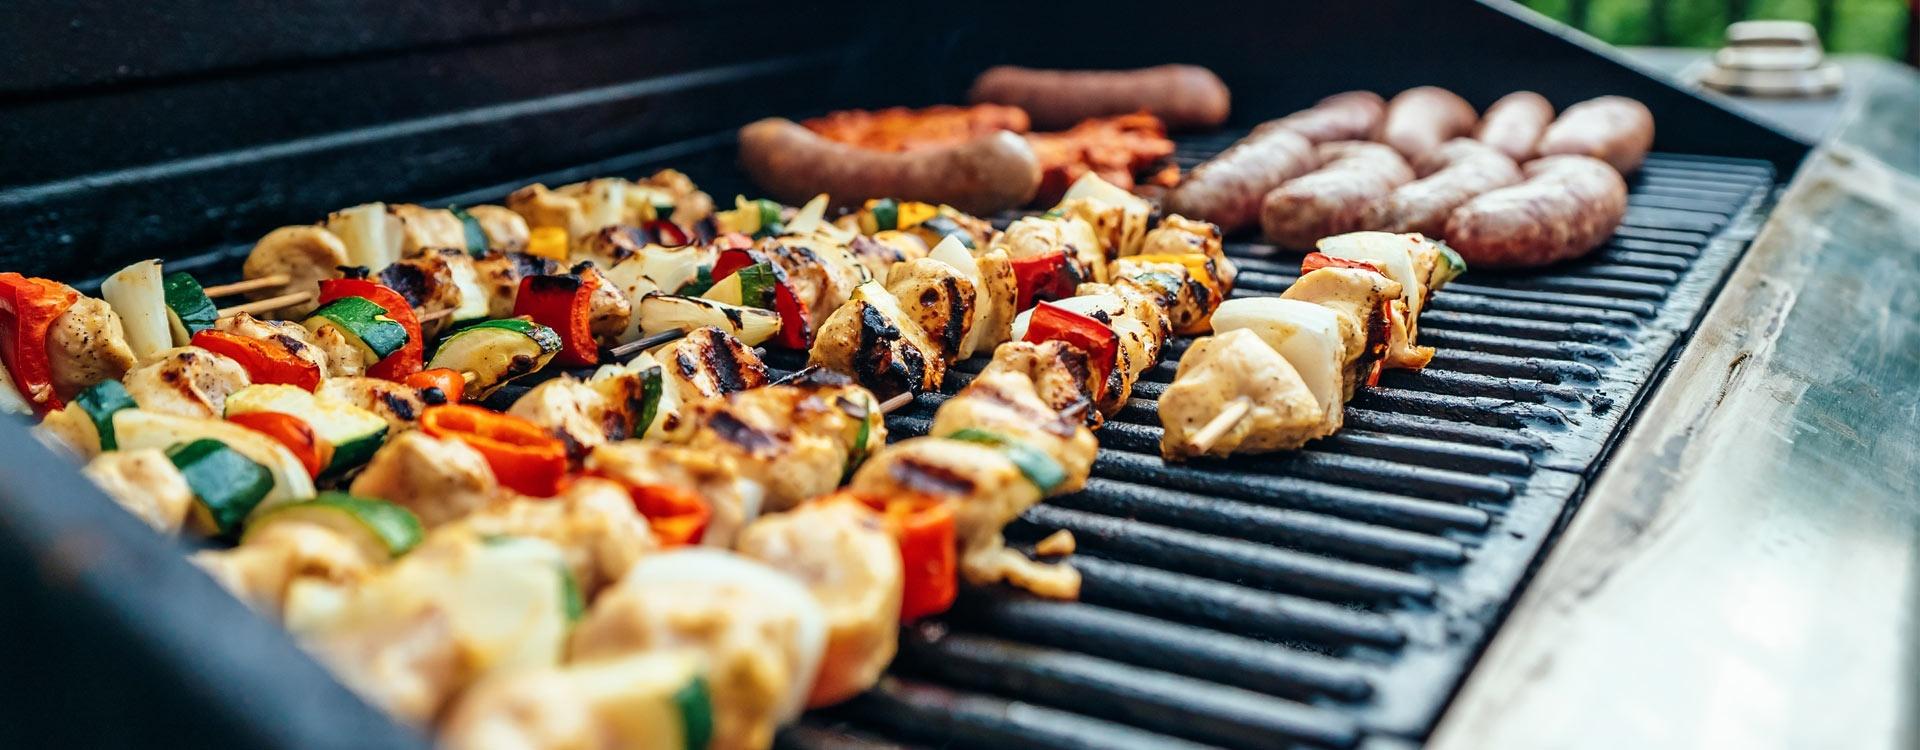 Sezon na grilla czas zacząć! Co musisz mieć w kuchni?